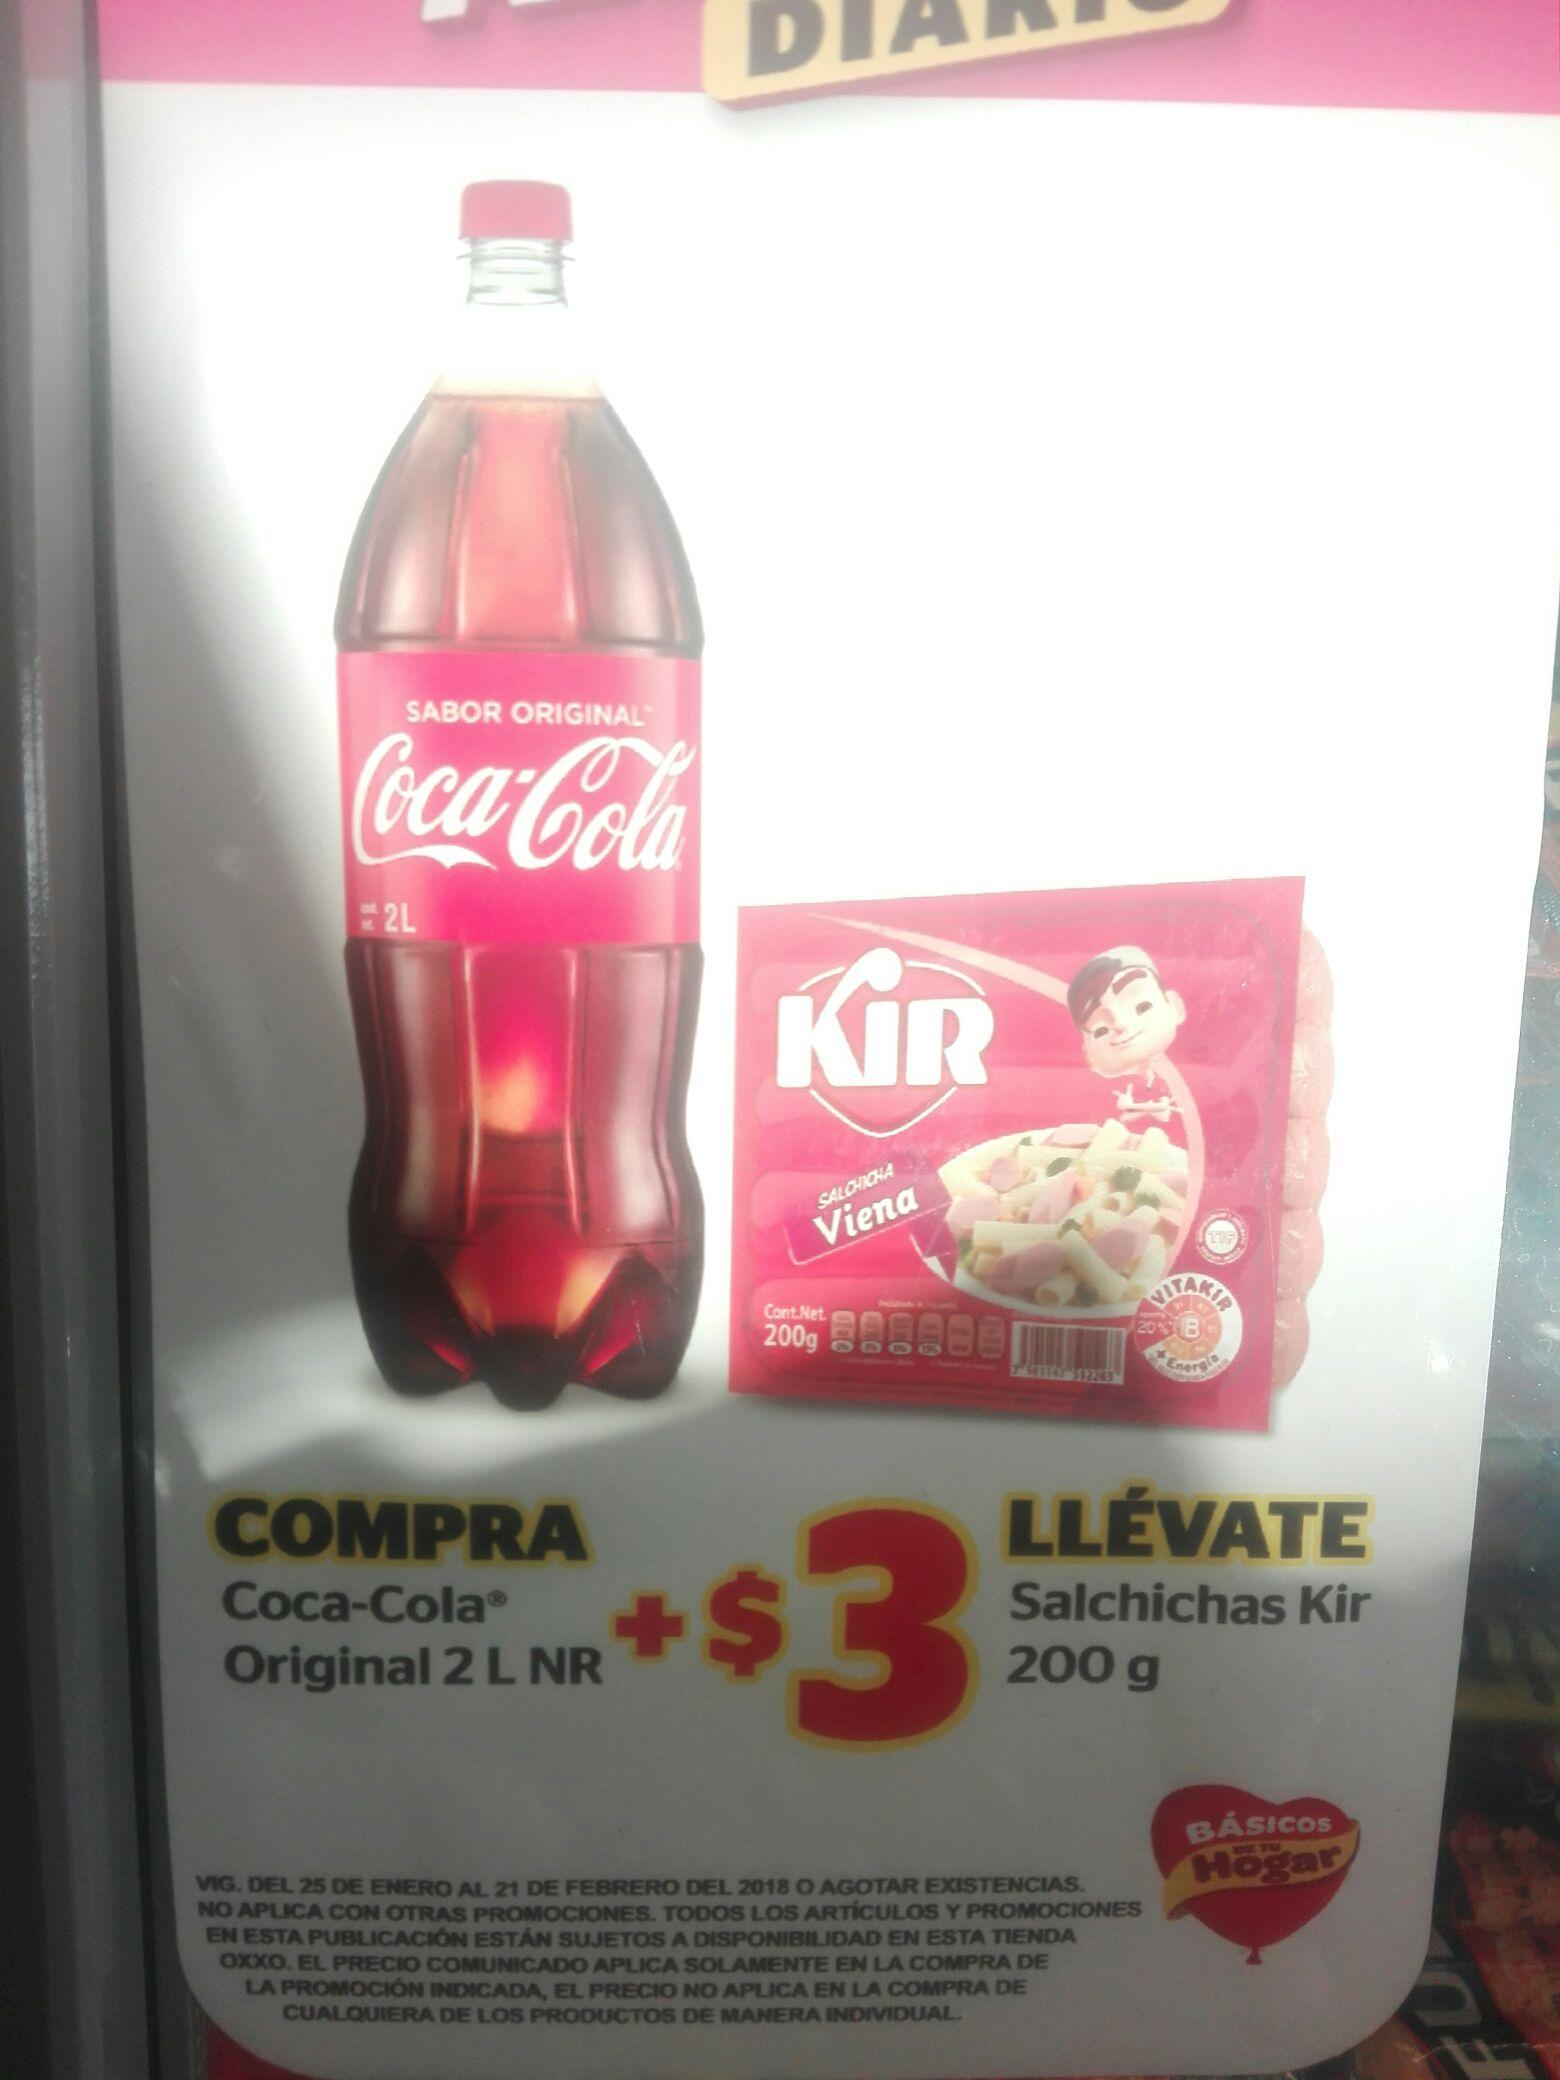 OXXO: Compra Coca Cola 2L + 3 pesos llevate Paquete de salchichas Kir